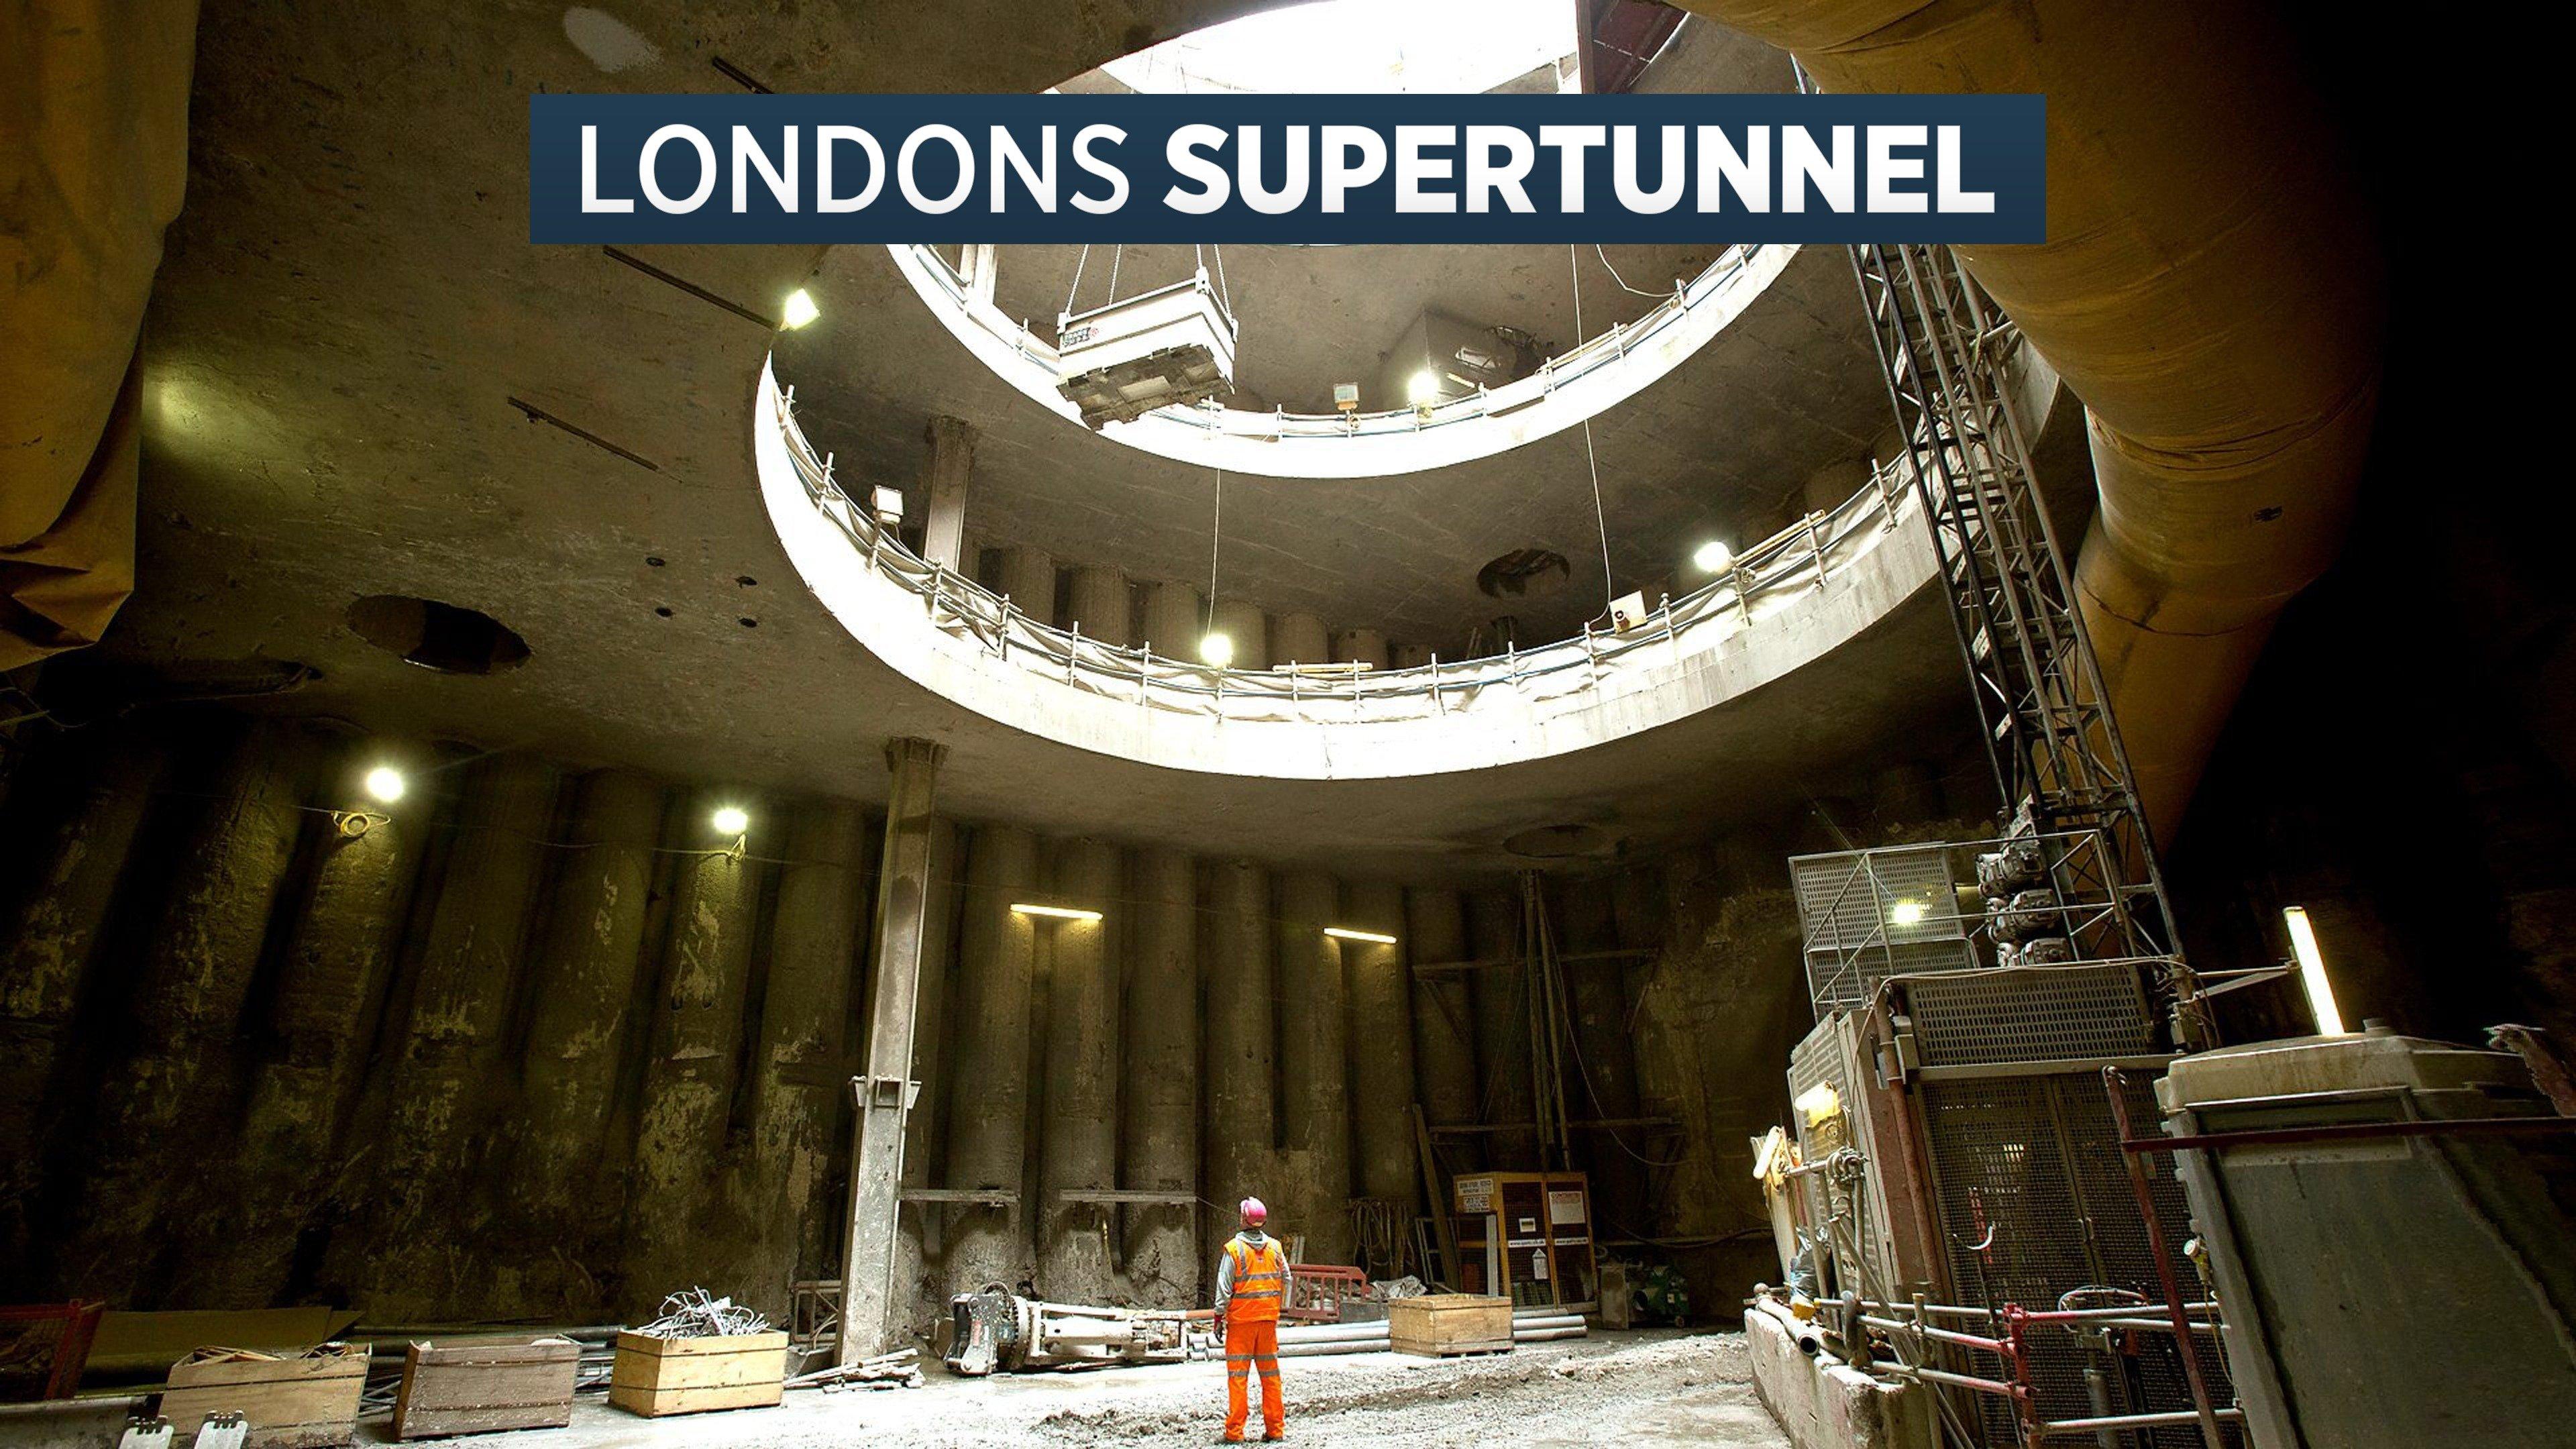 Londons supertunnel